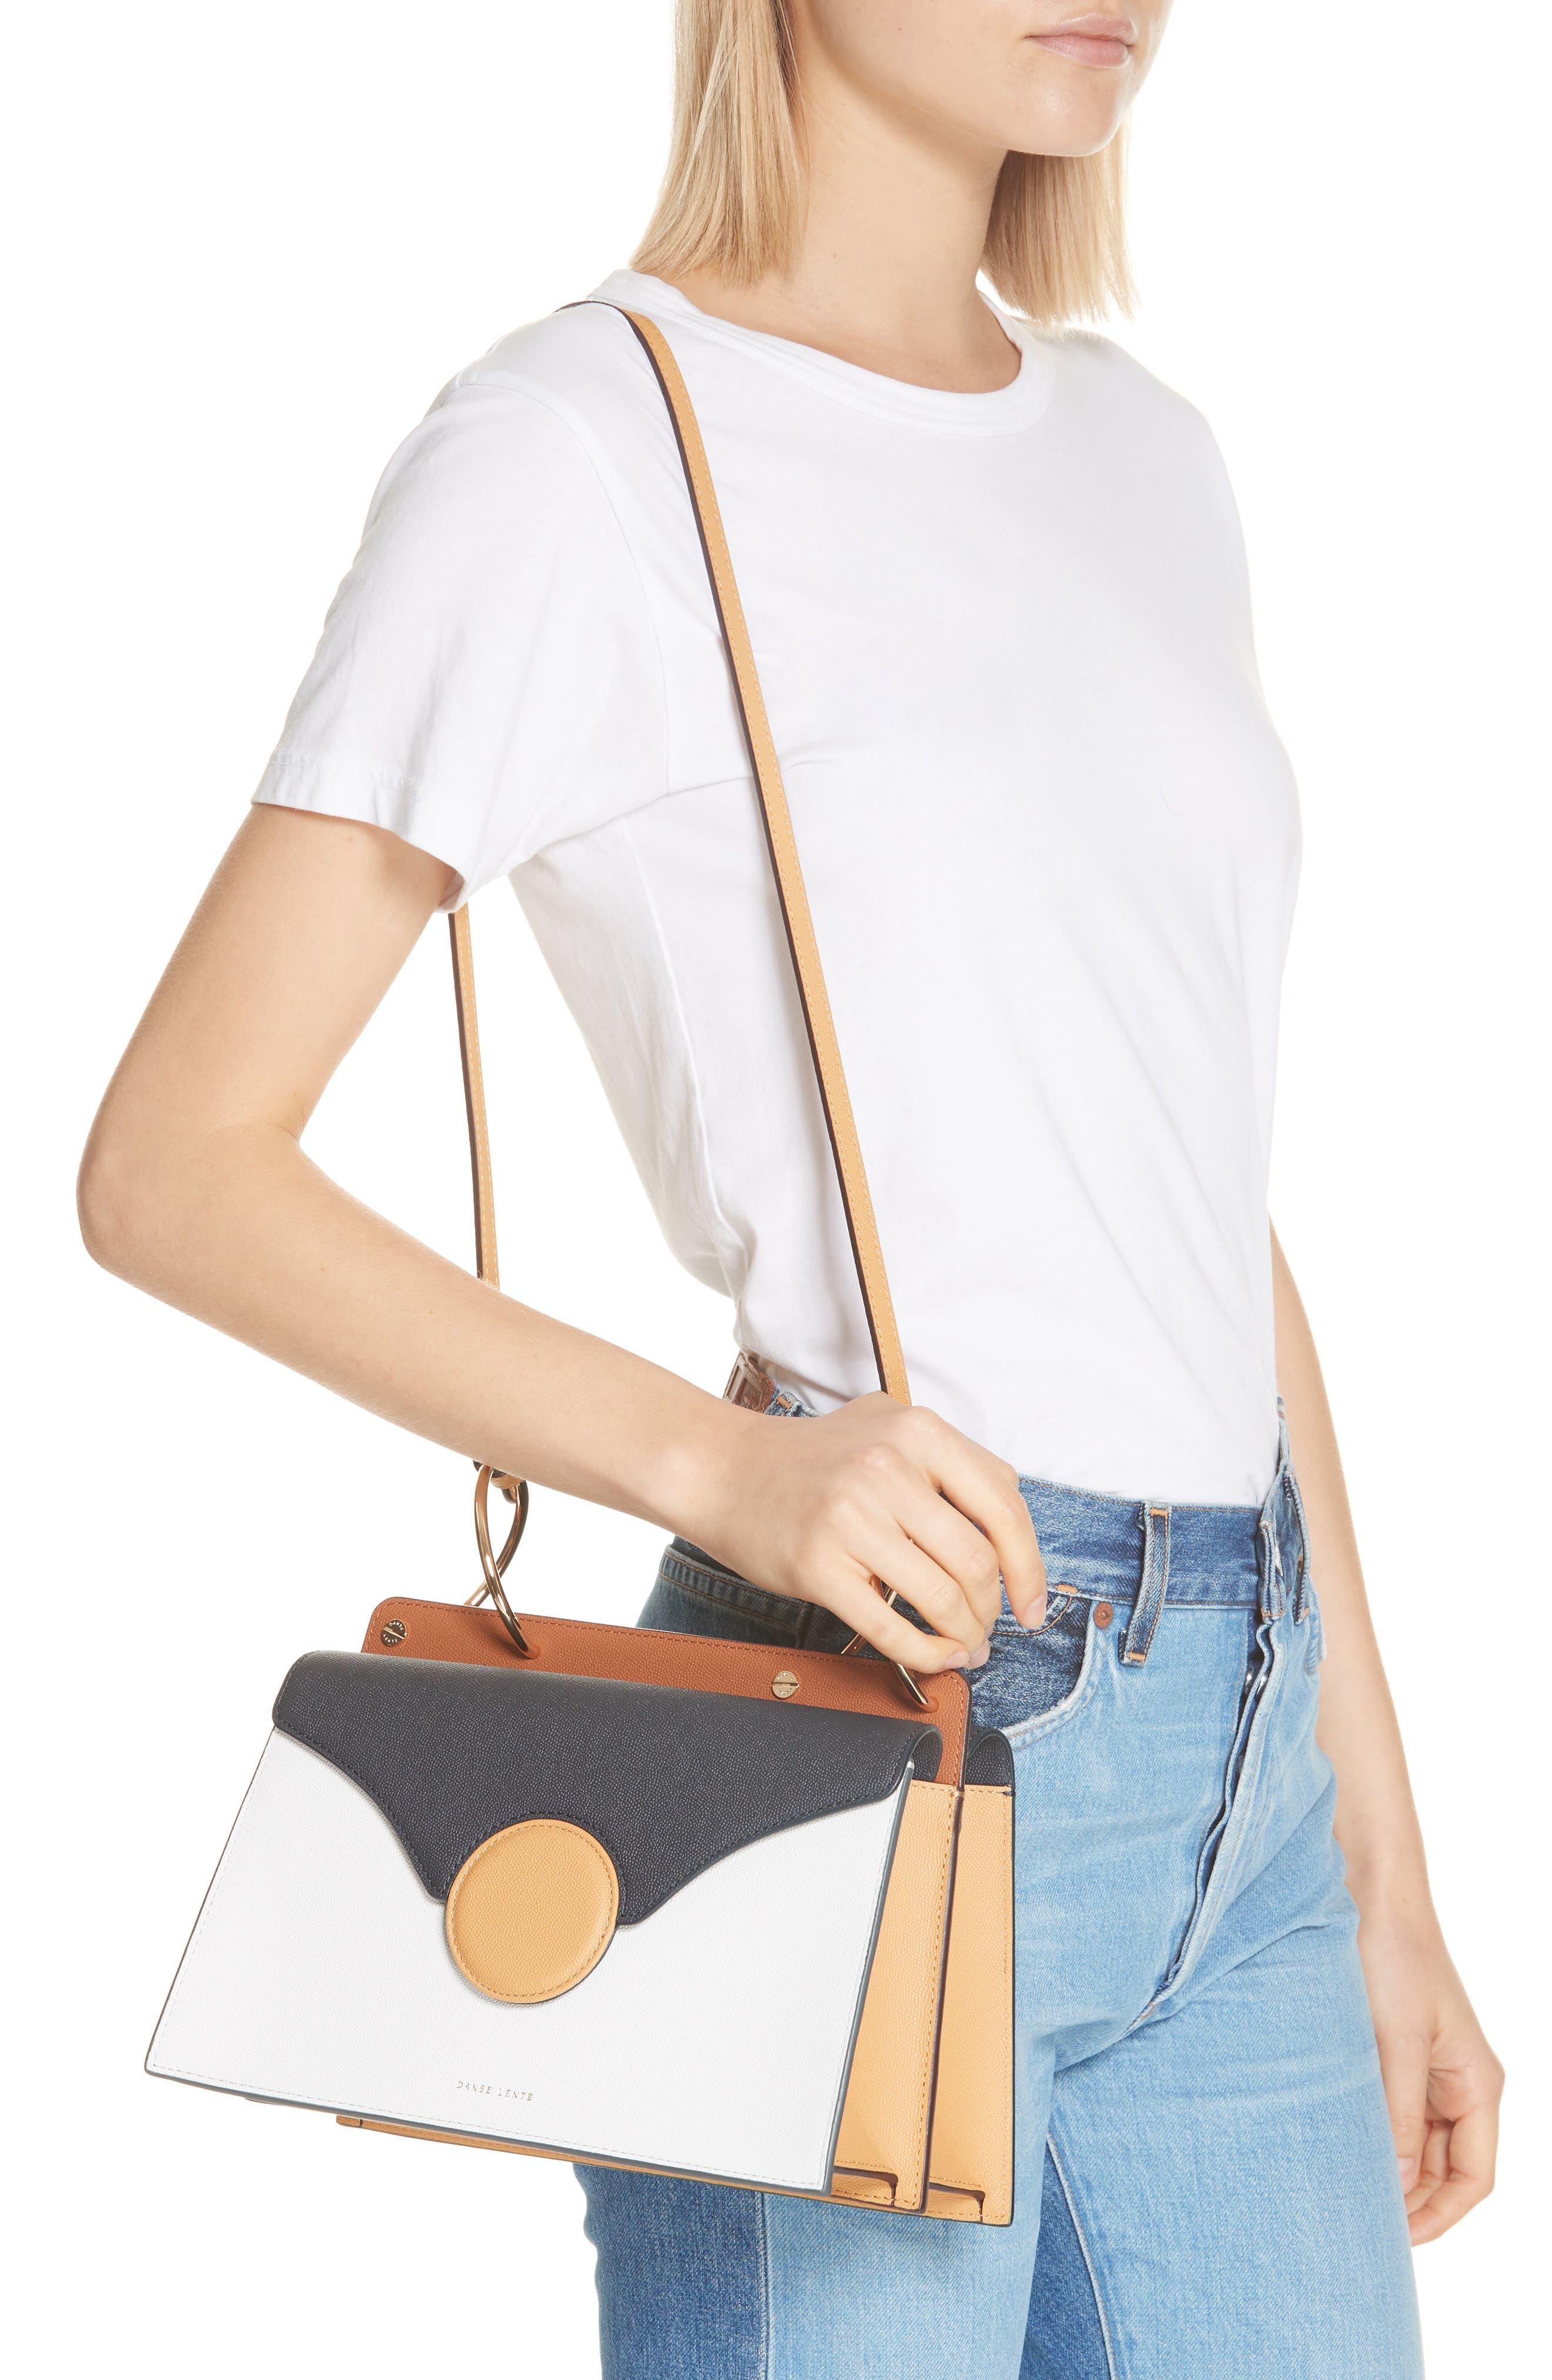 Phoebe Leather Crossbody Bag,                             Alternate thumbnail 2, color,                             MARINE/ SAND